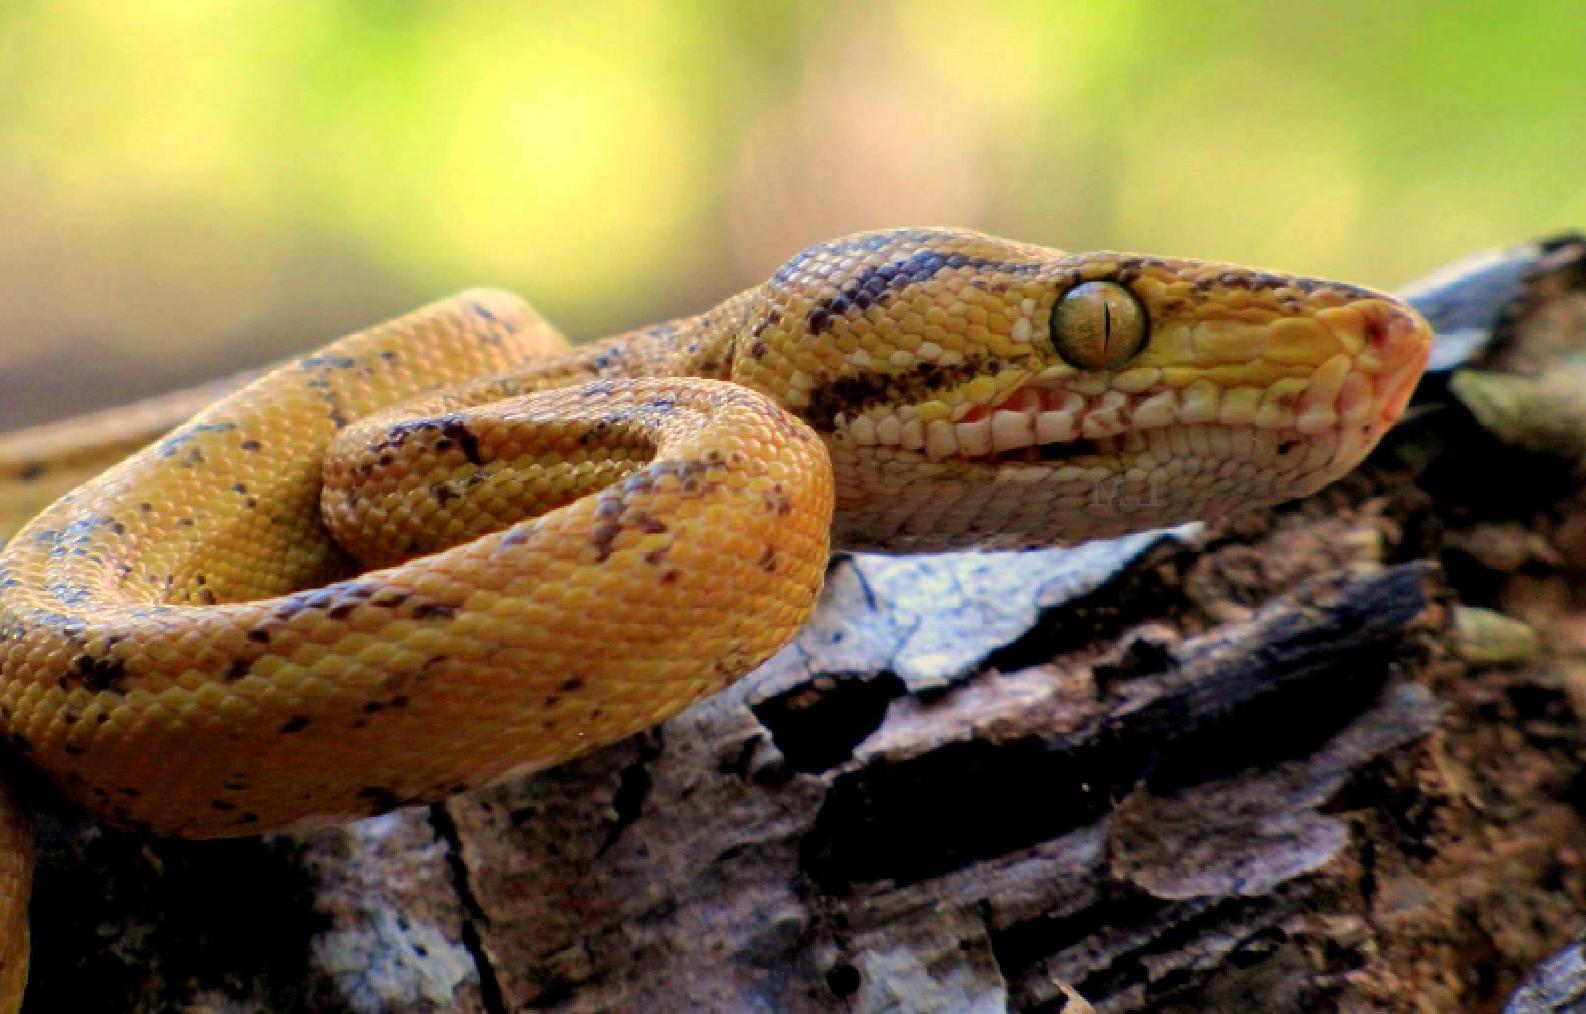 snake.Guyana